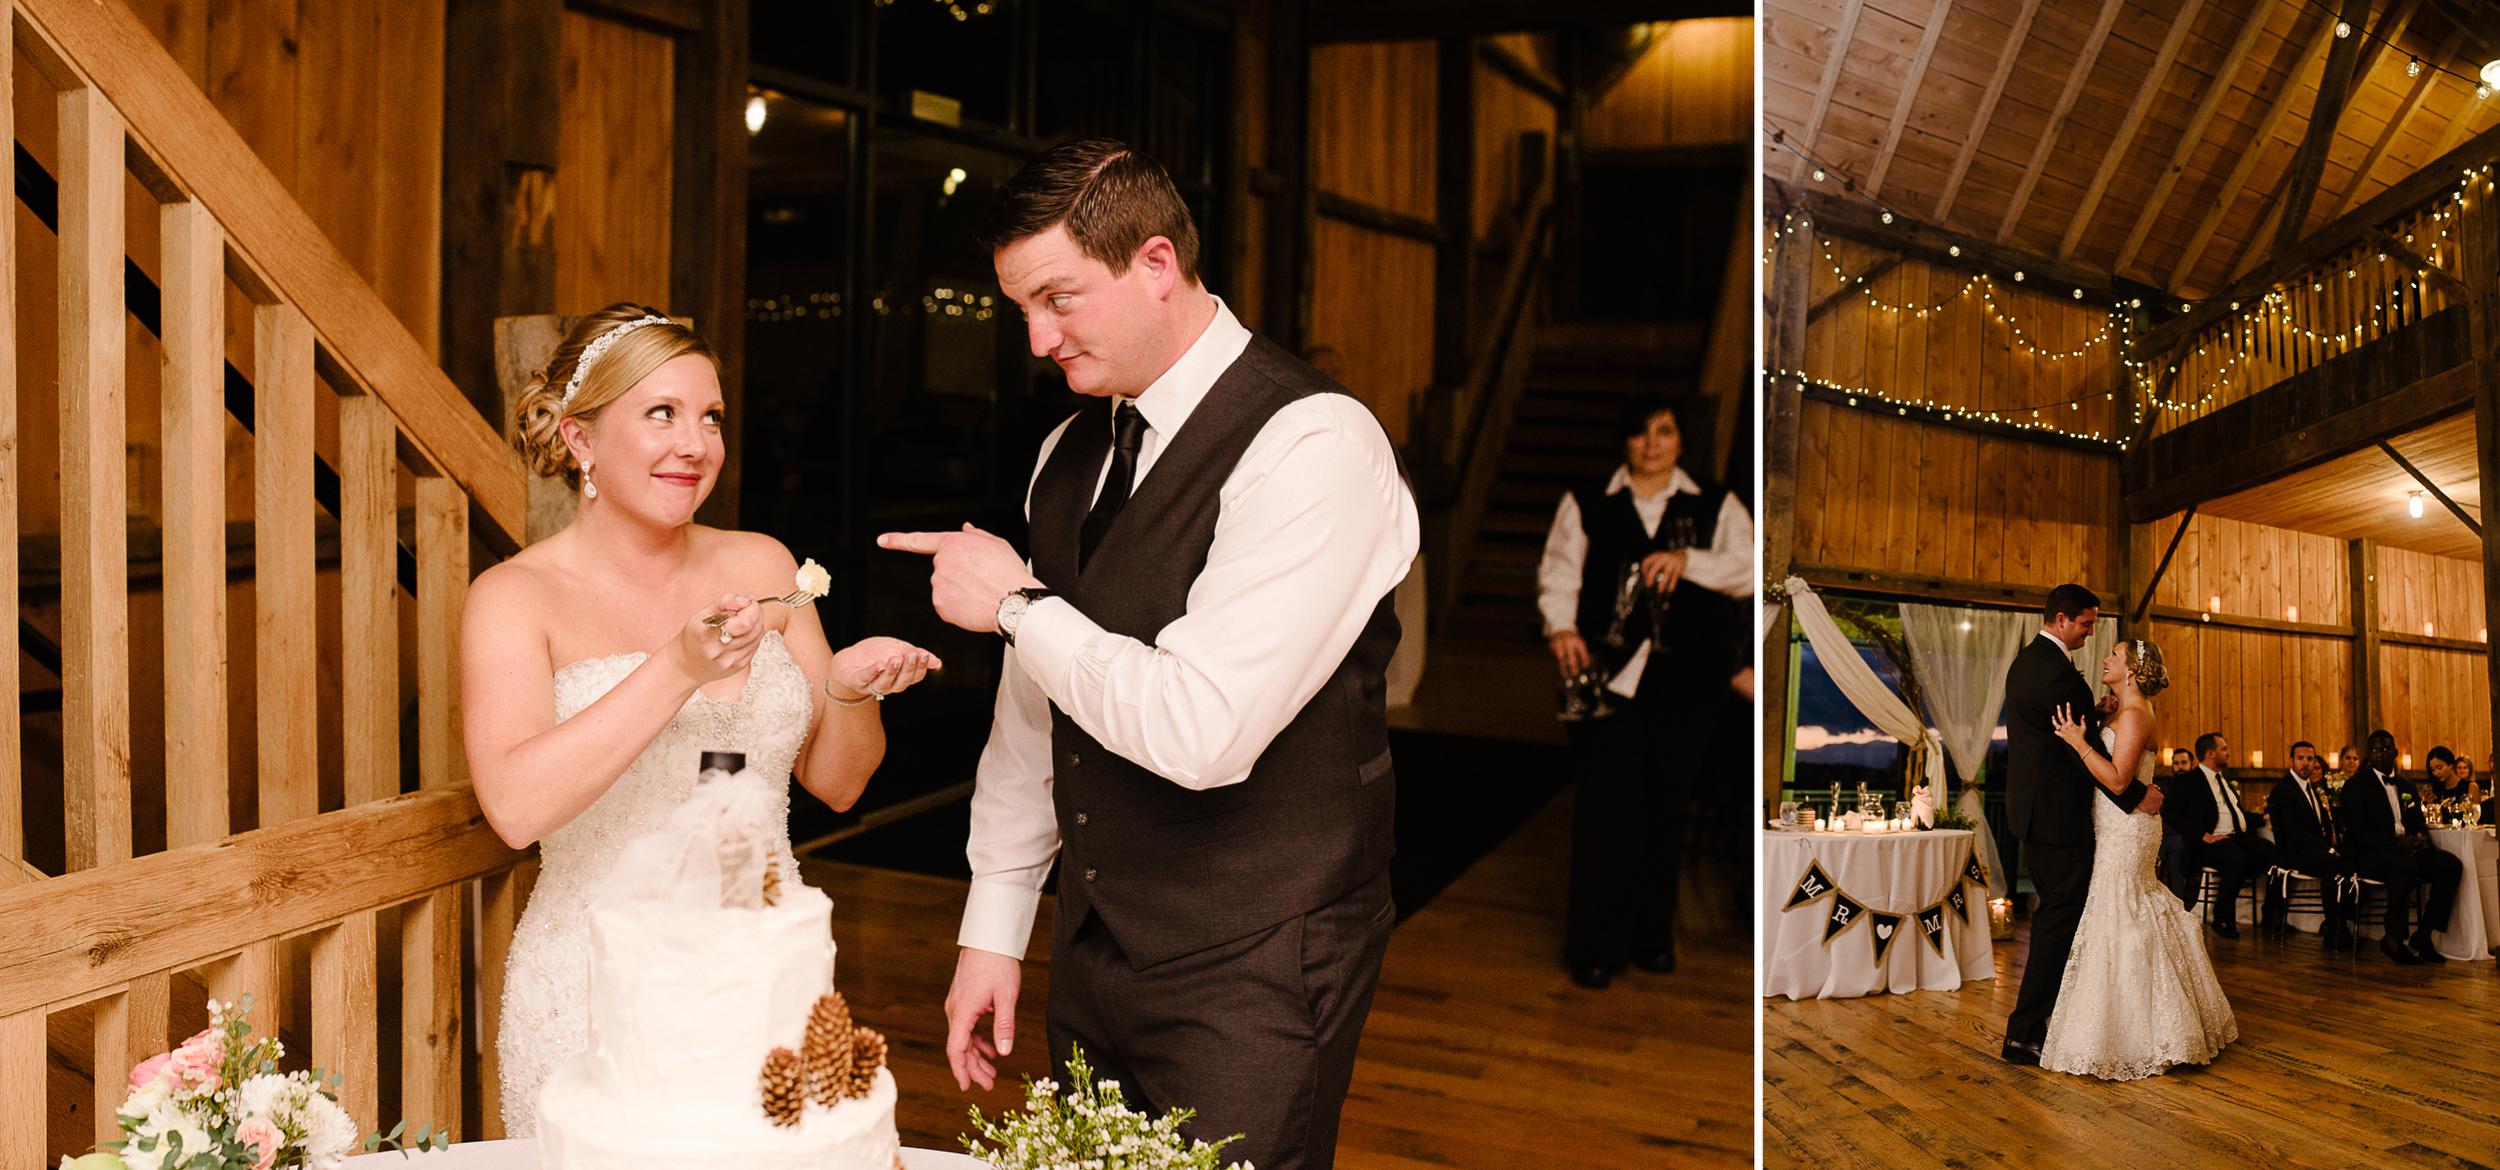 white barn wedding cake cutting.jpg